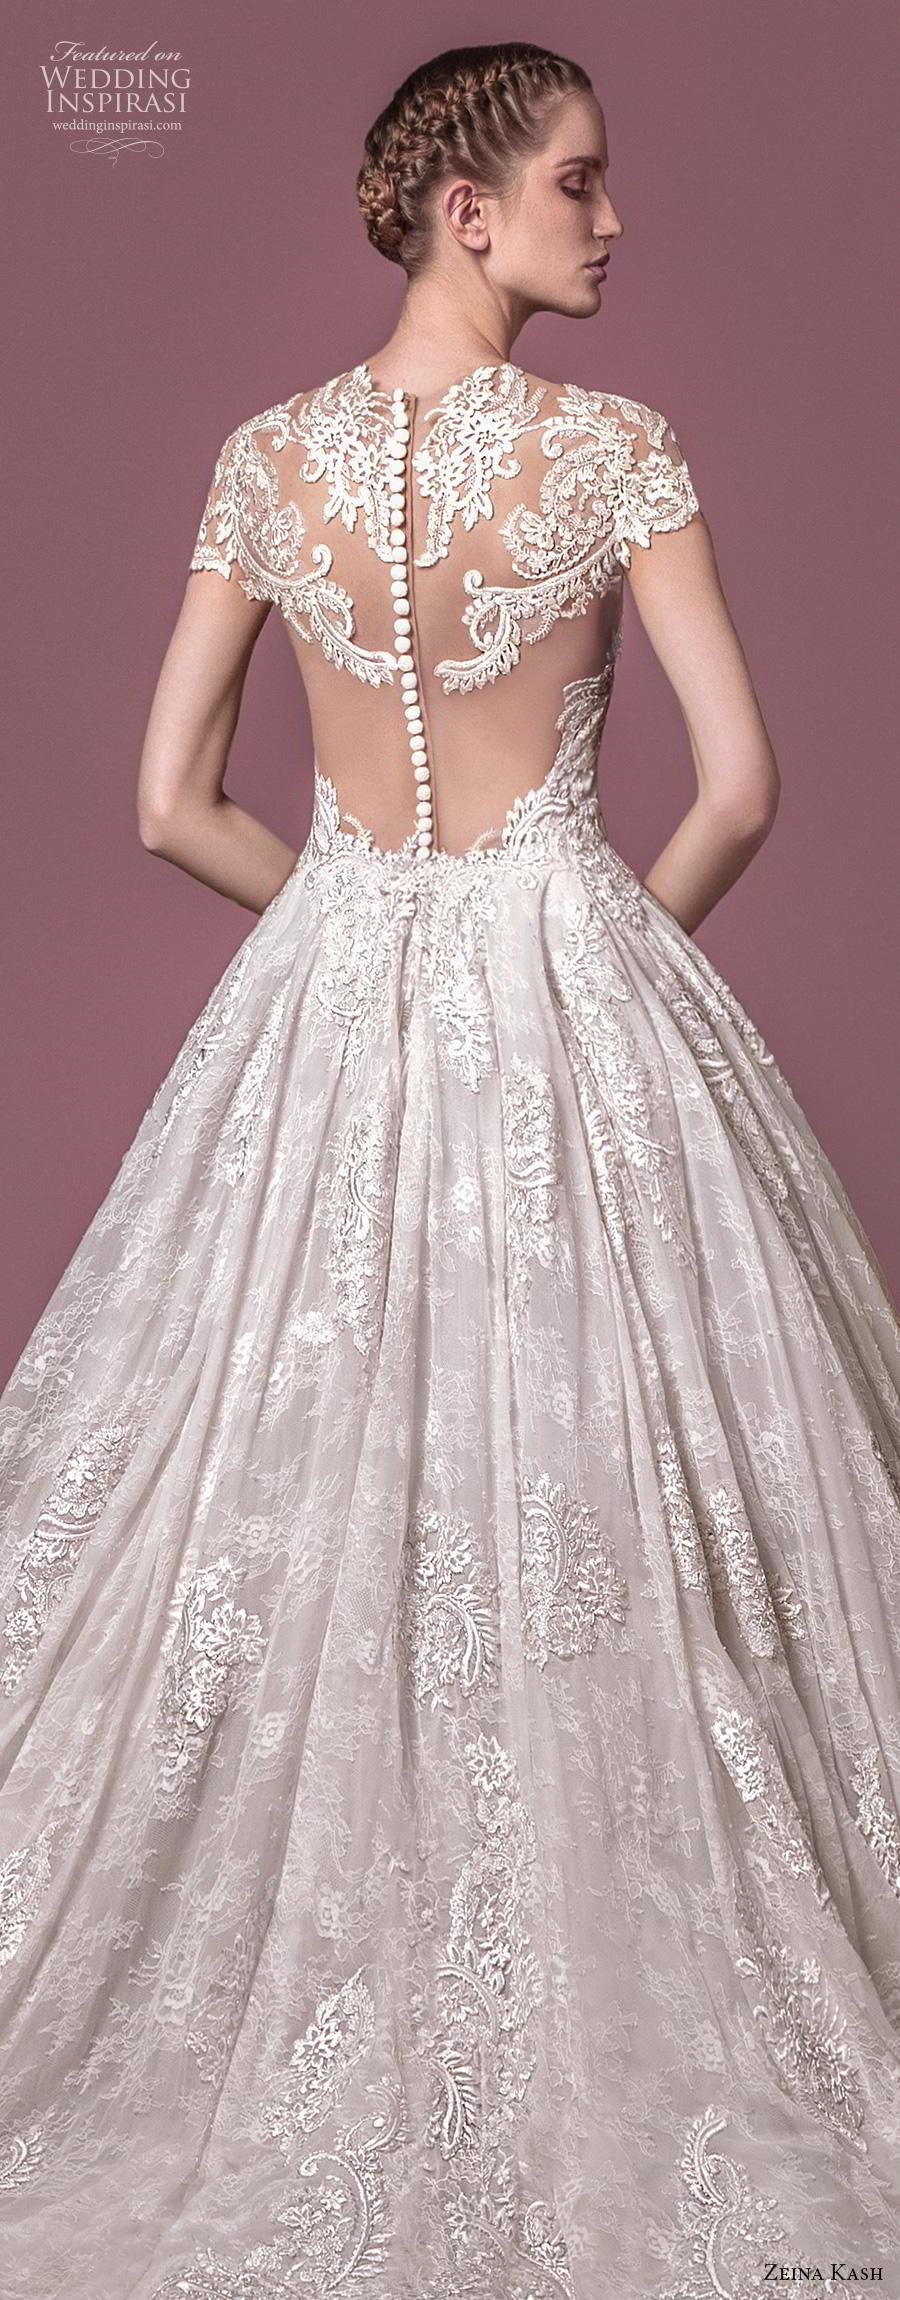 zeina kash 2018 bridal cap sleeves sweetheart neckline full embellishment elegant princess a  line wedding dress lace button back chapel train (3) zbv